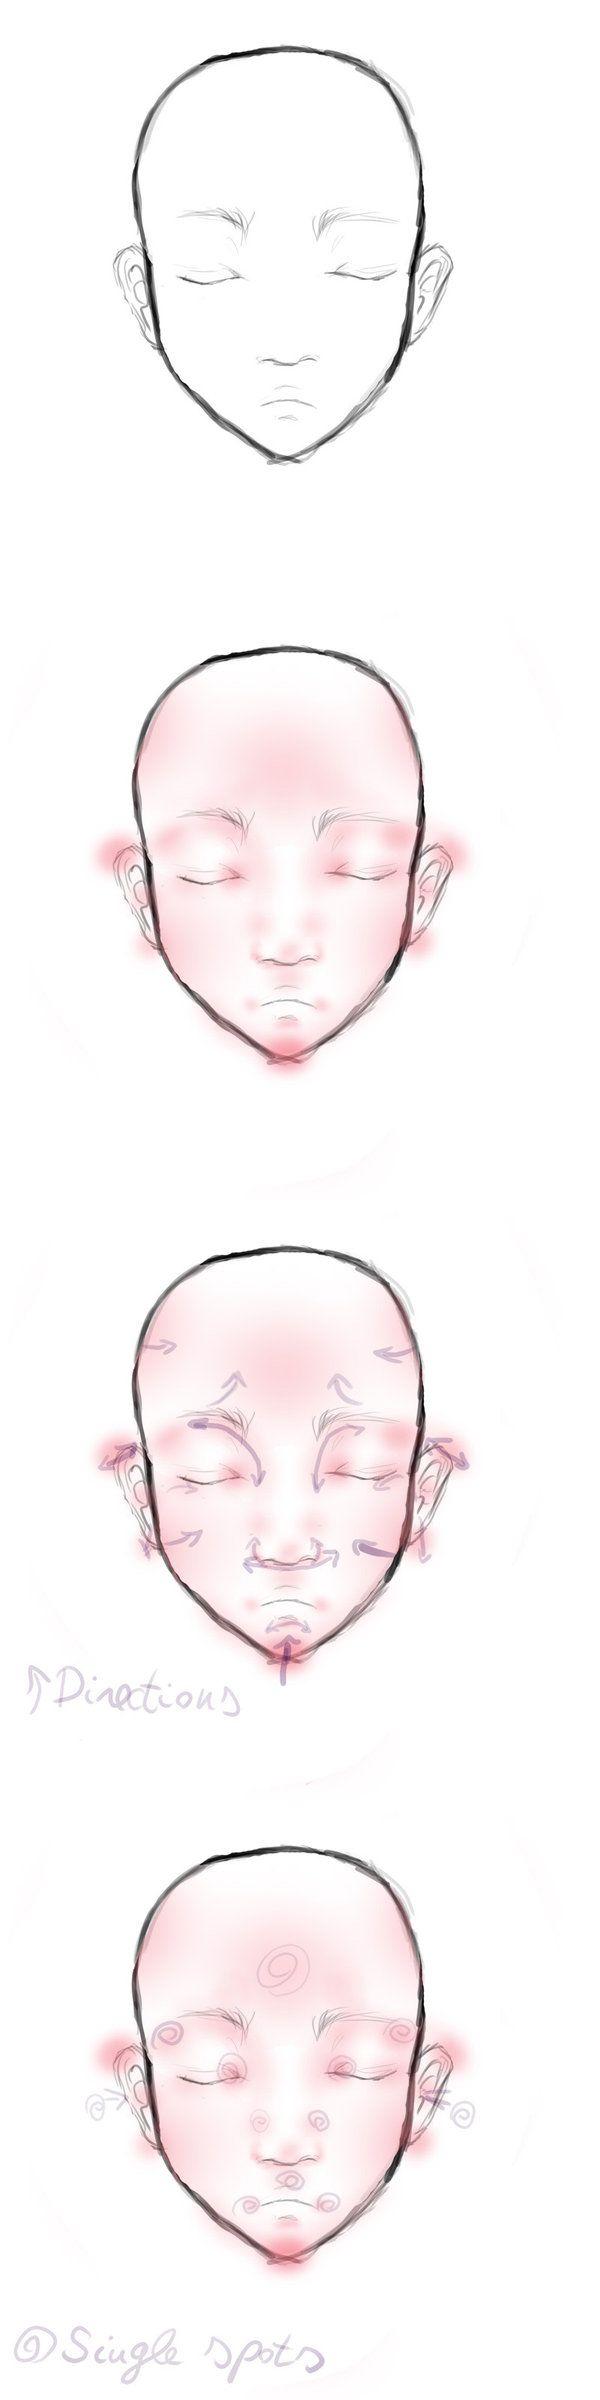 Face Blushing Tutorial by NiuKy.deviantart.com on @deviantART